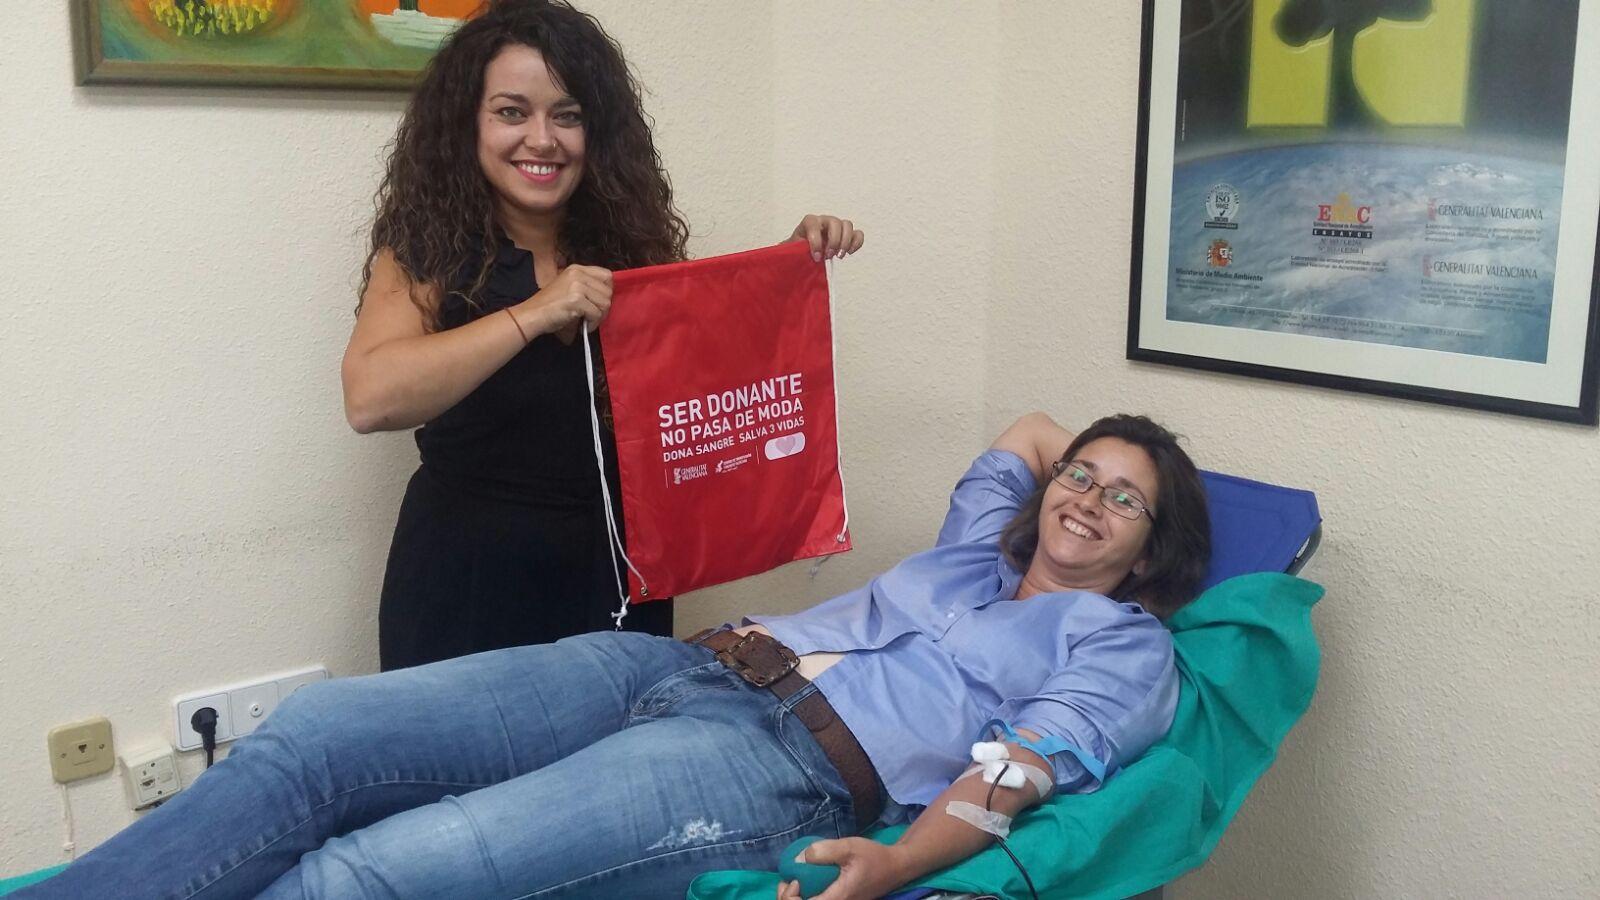 https://www.iproma.com/es/iproma-colabora-por-cuarto-ao-consecutivo-con-el-centro-de-transfusin-de-sangre-de-la-comunitat-valenciana/